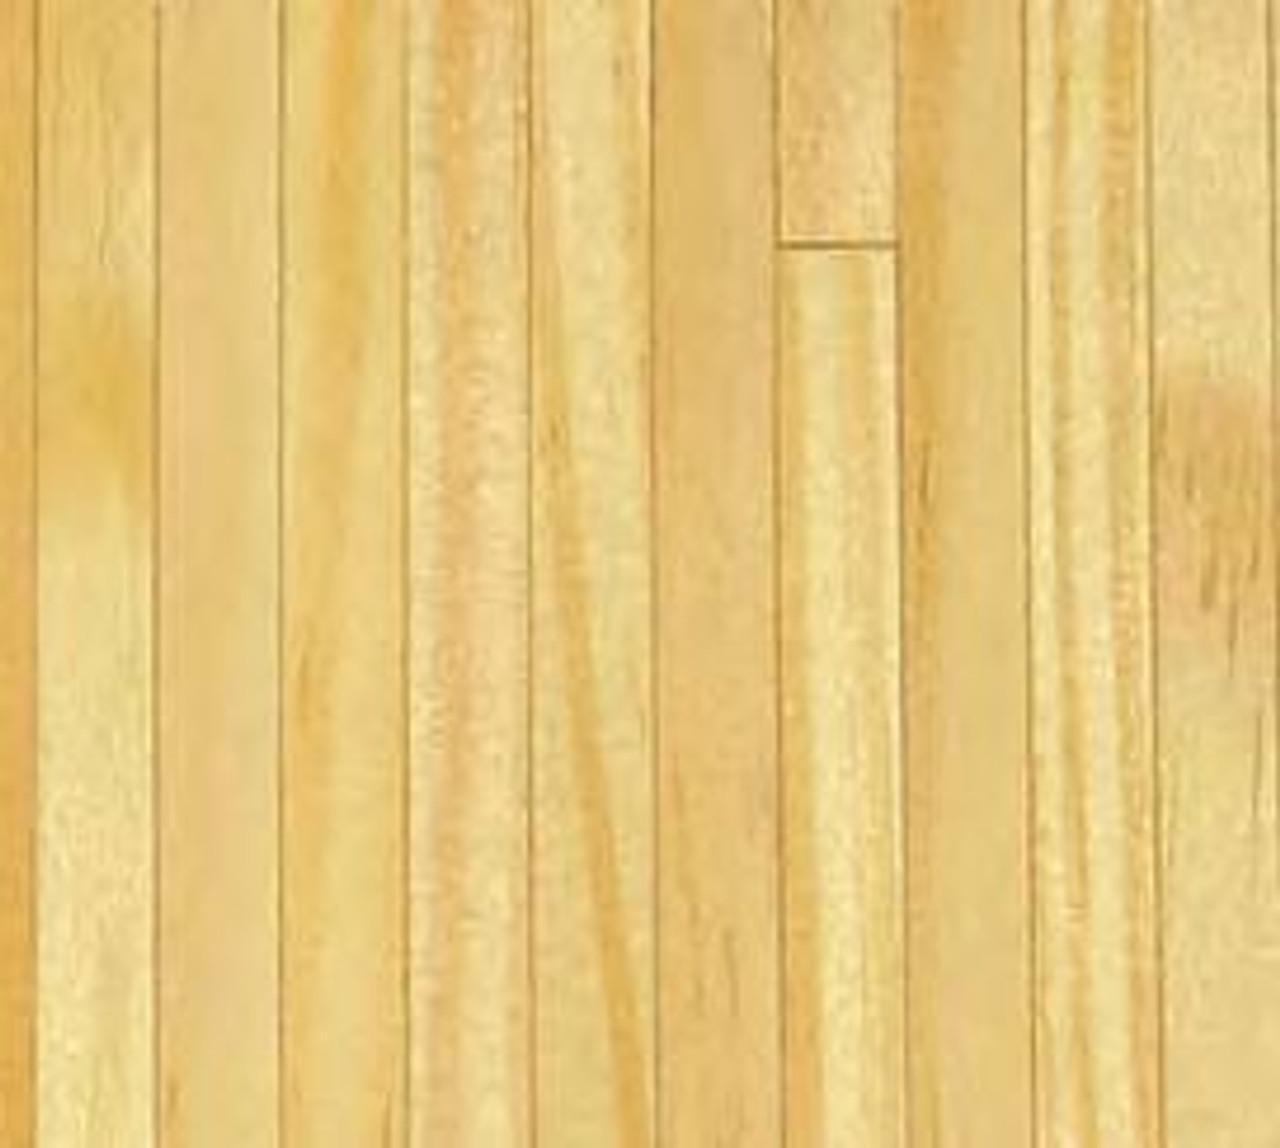 American Southern Pine Floor